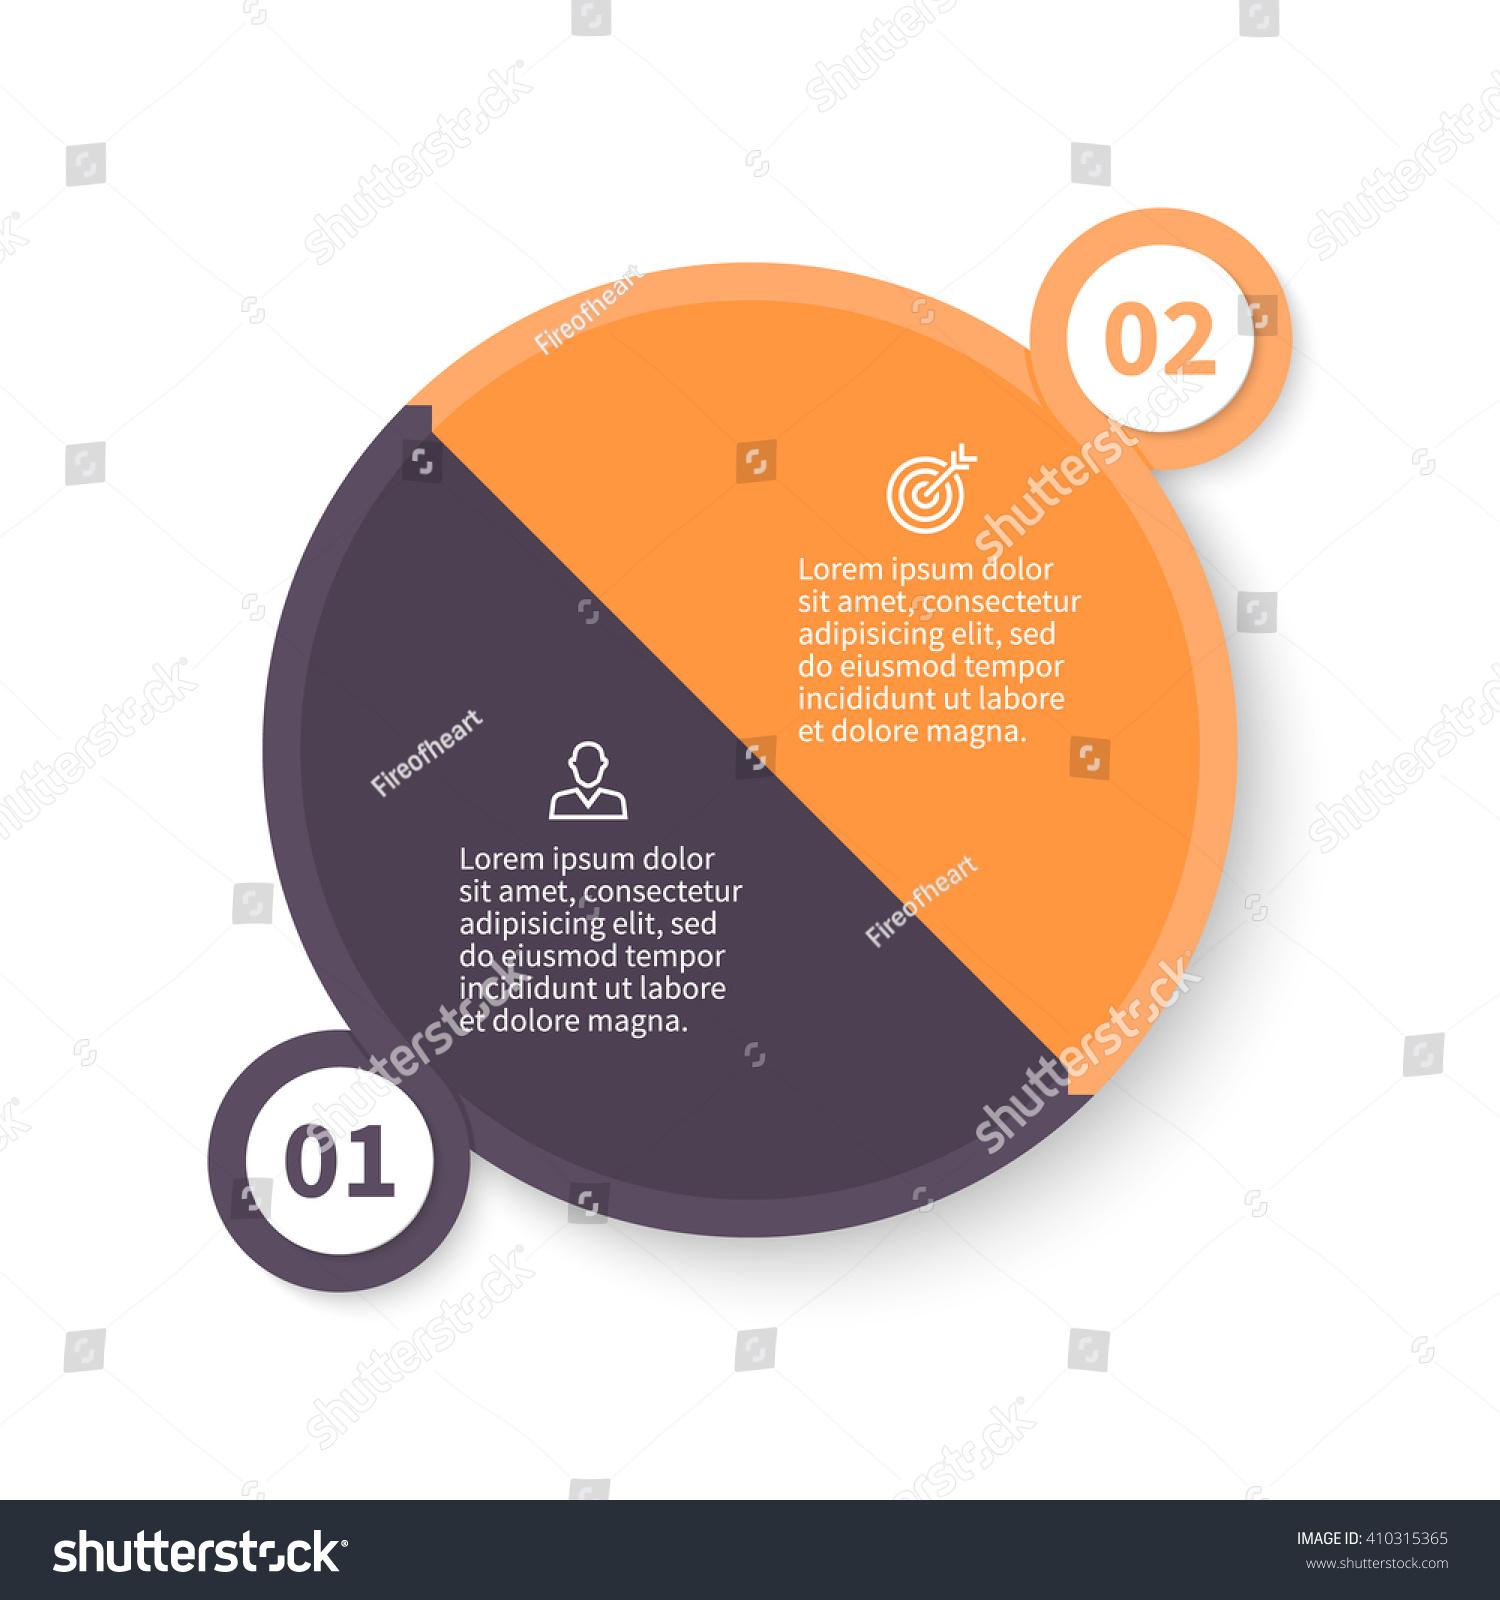 Circular infographic pie chart diagram graph stock vector pie chart diagram graph with 2 steps options parts nvjuhfo Choice Image